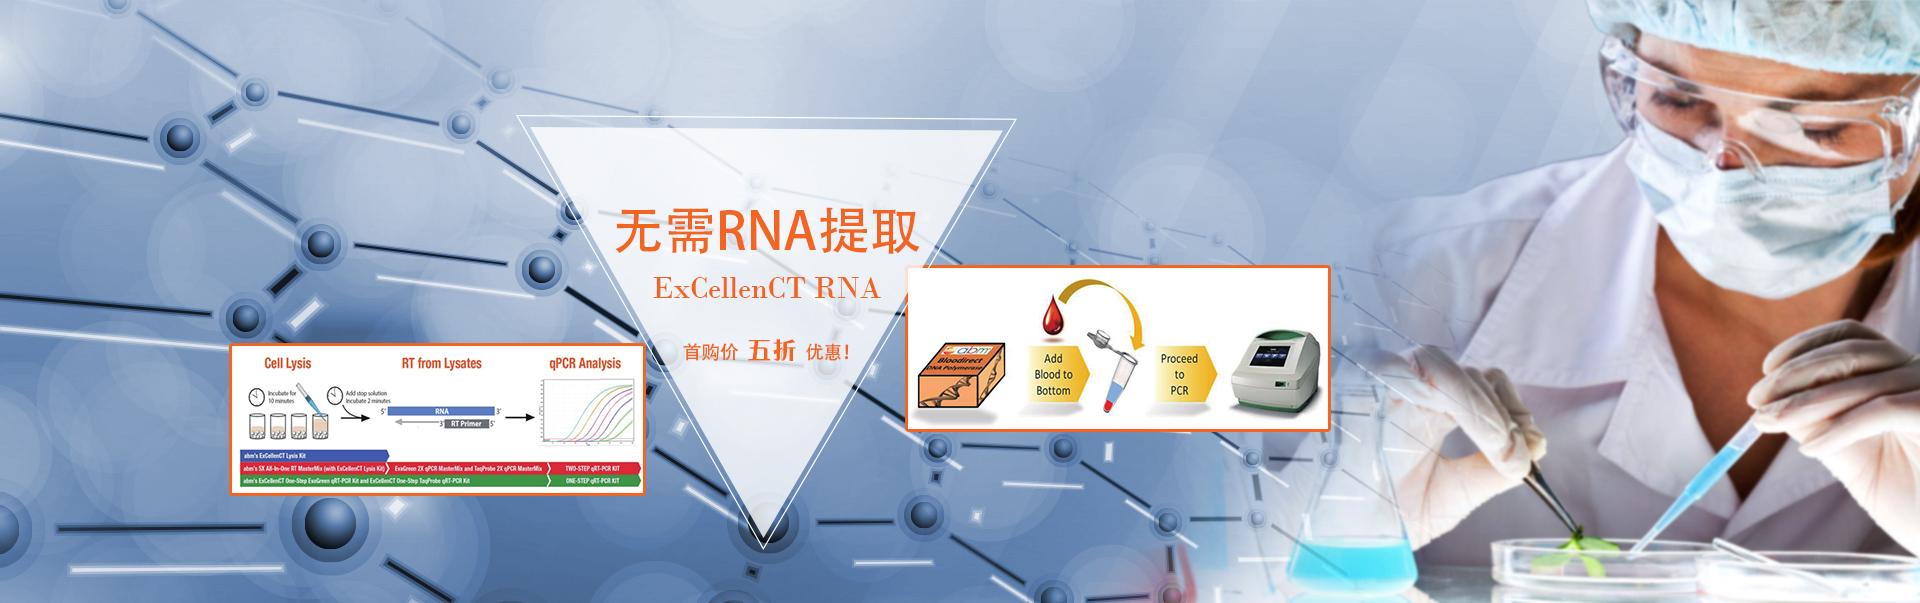 abm banner,无需RNA提取,首购价5折优惠